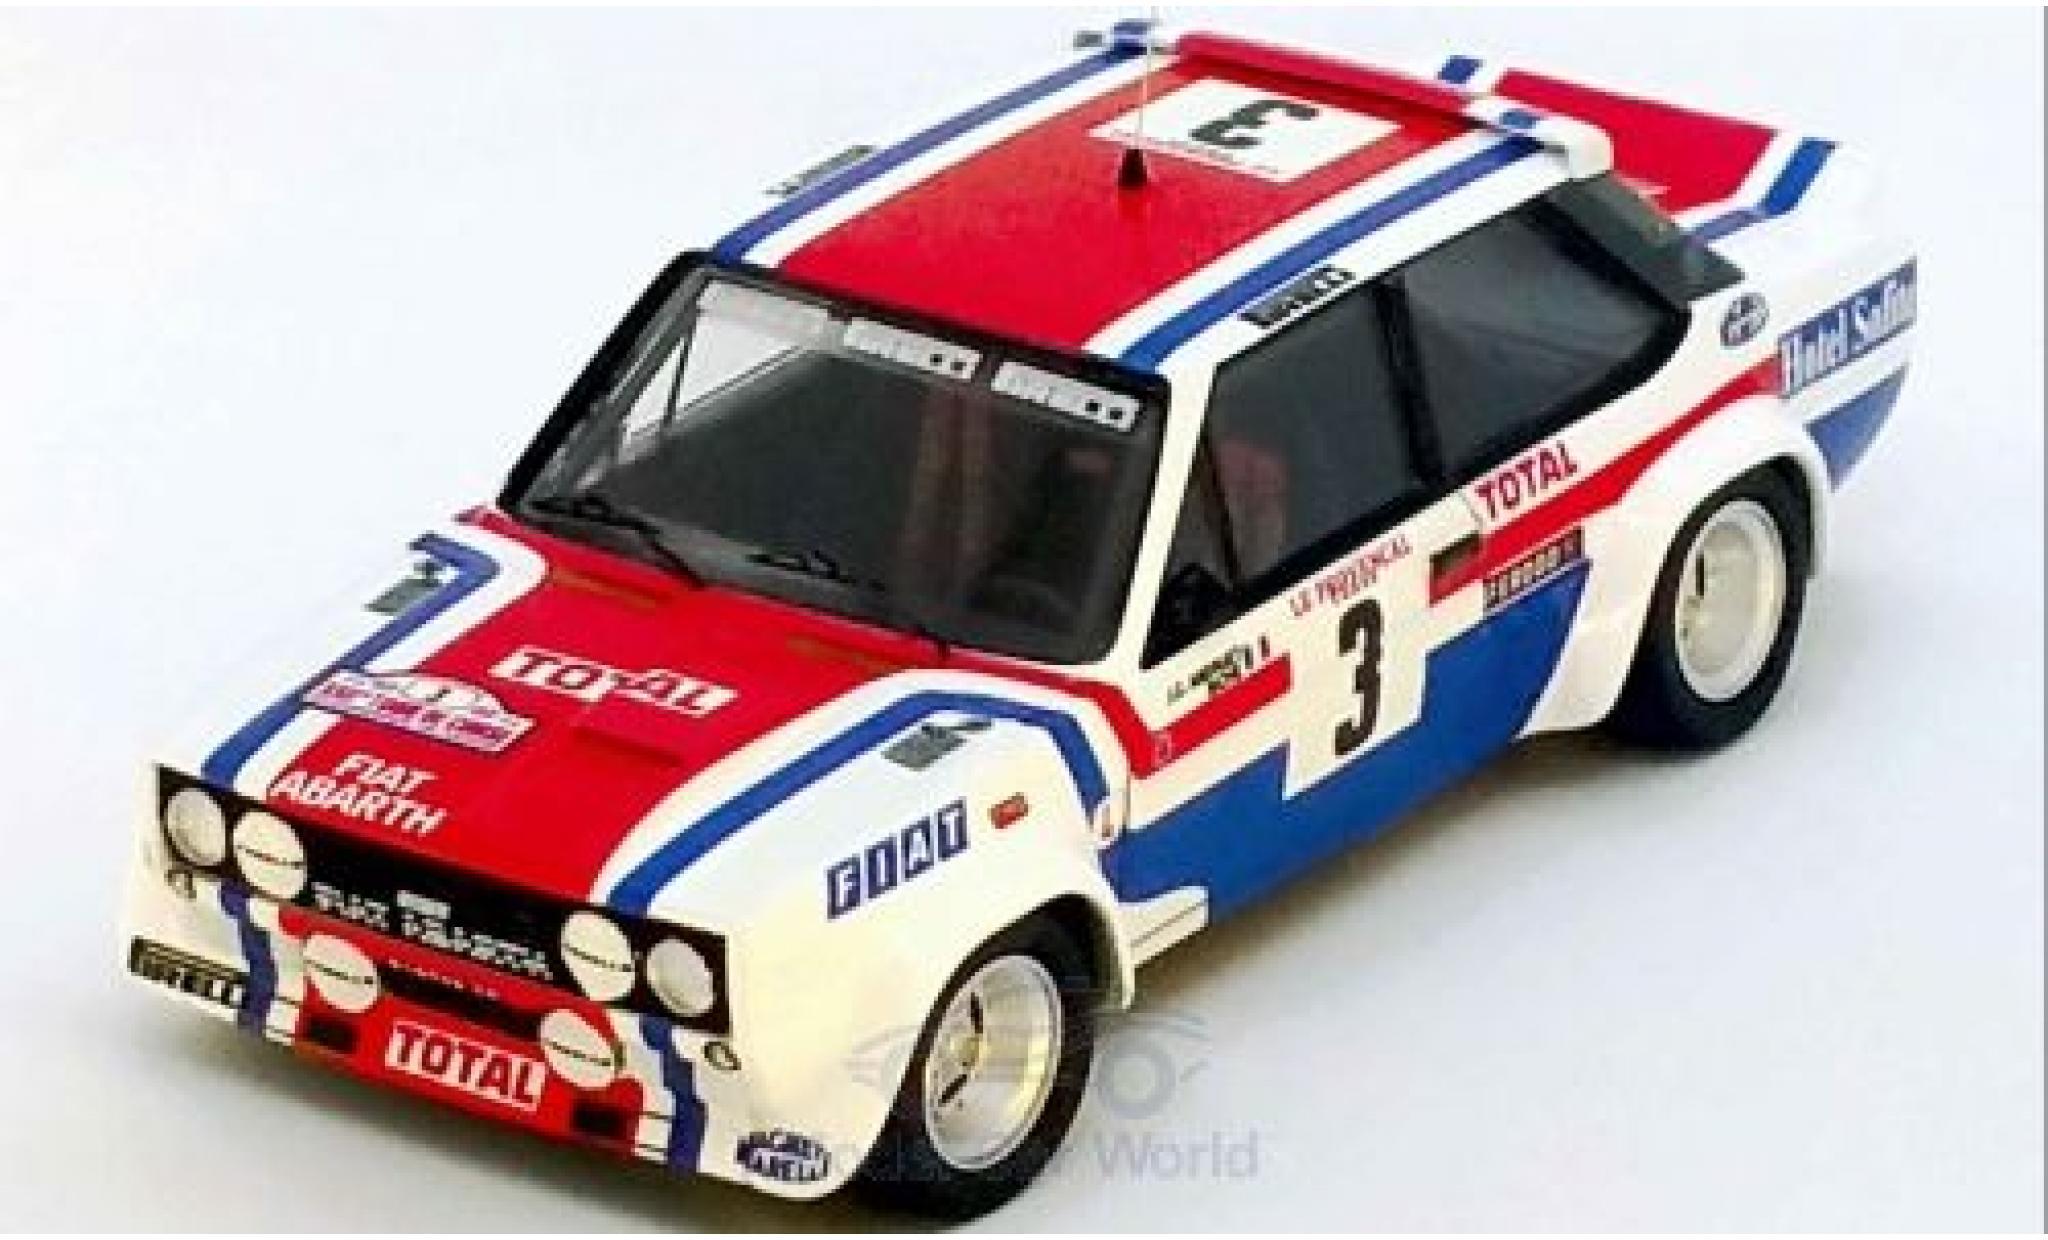 Fiat 131 1/43 Trofeu Abarth No.3 Rallye WM Tour de Corse 1978 J-C.Andruet/Biche